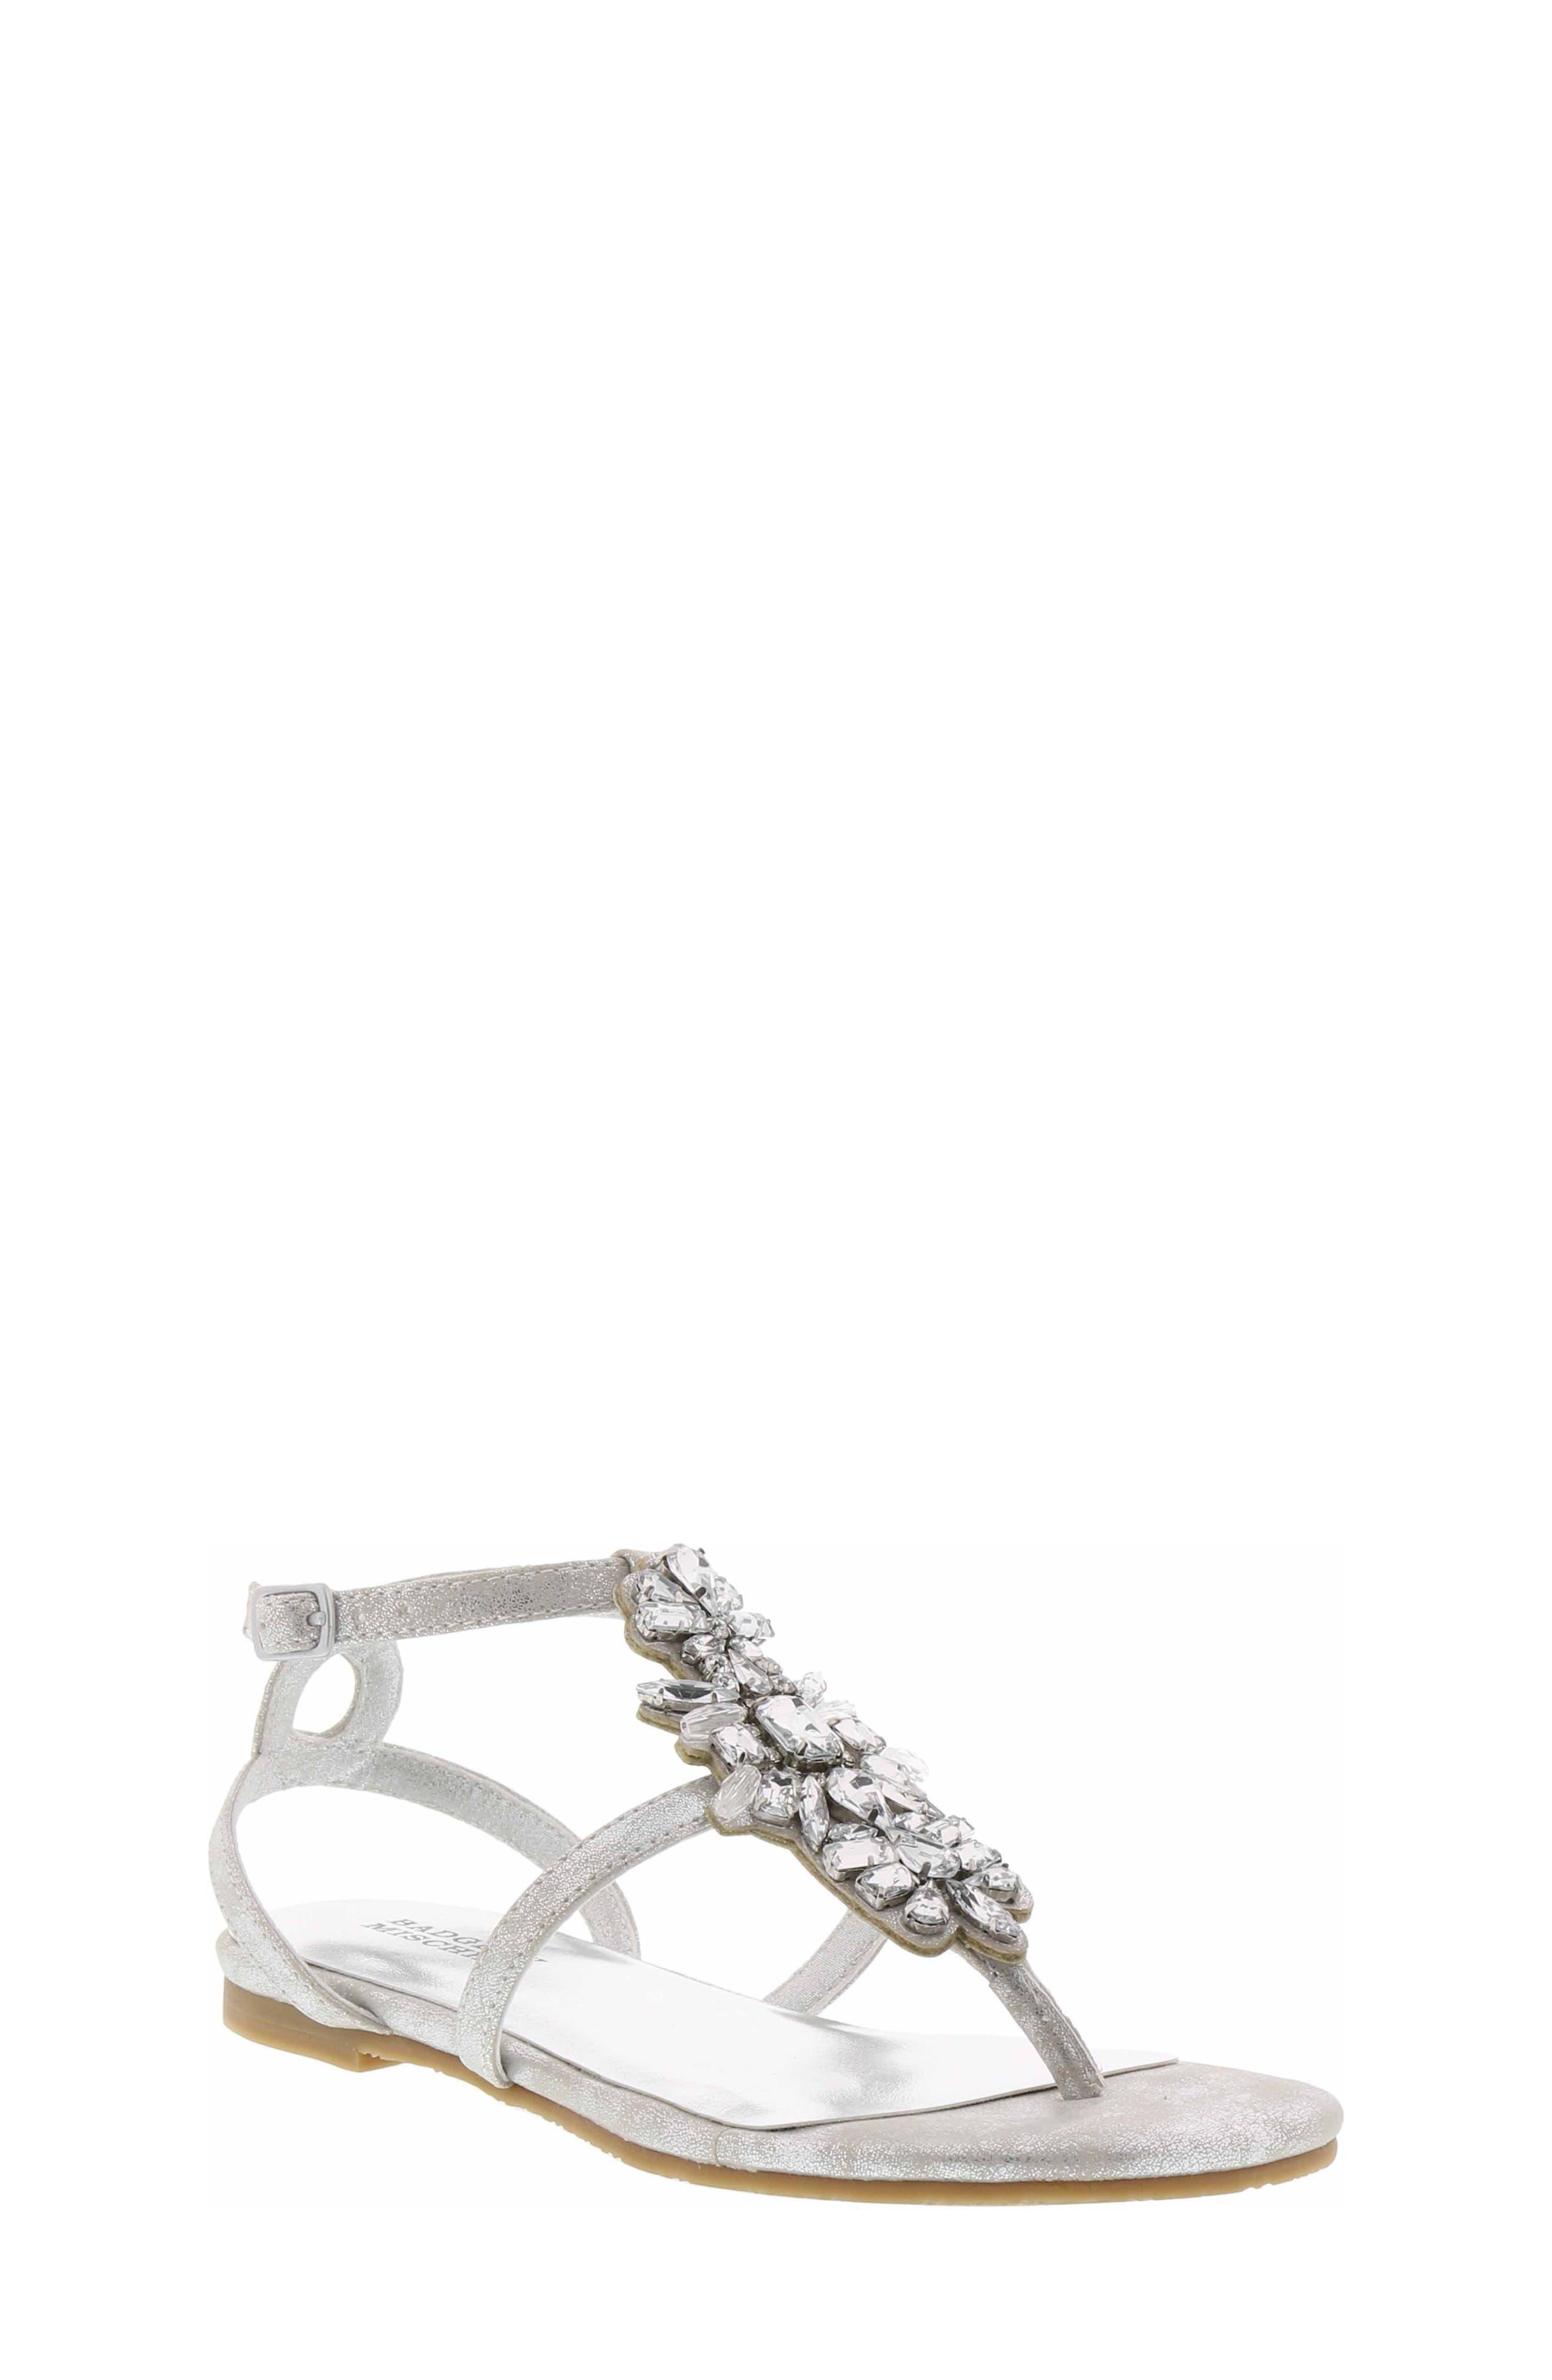 Cara Barstow Embellished Sandal,                         Main,                         color, 040